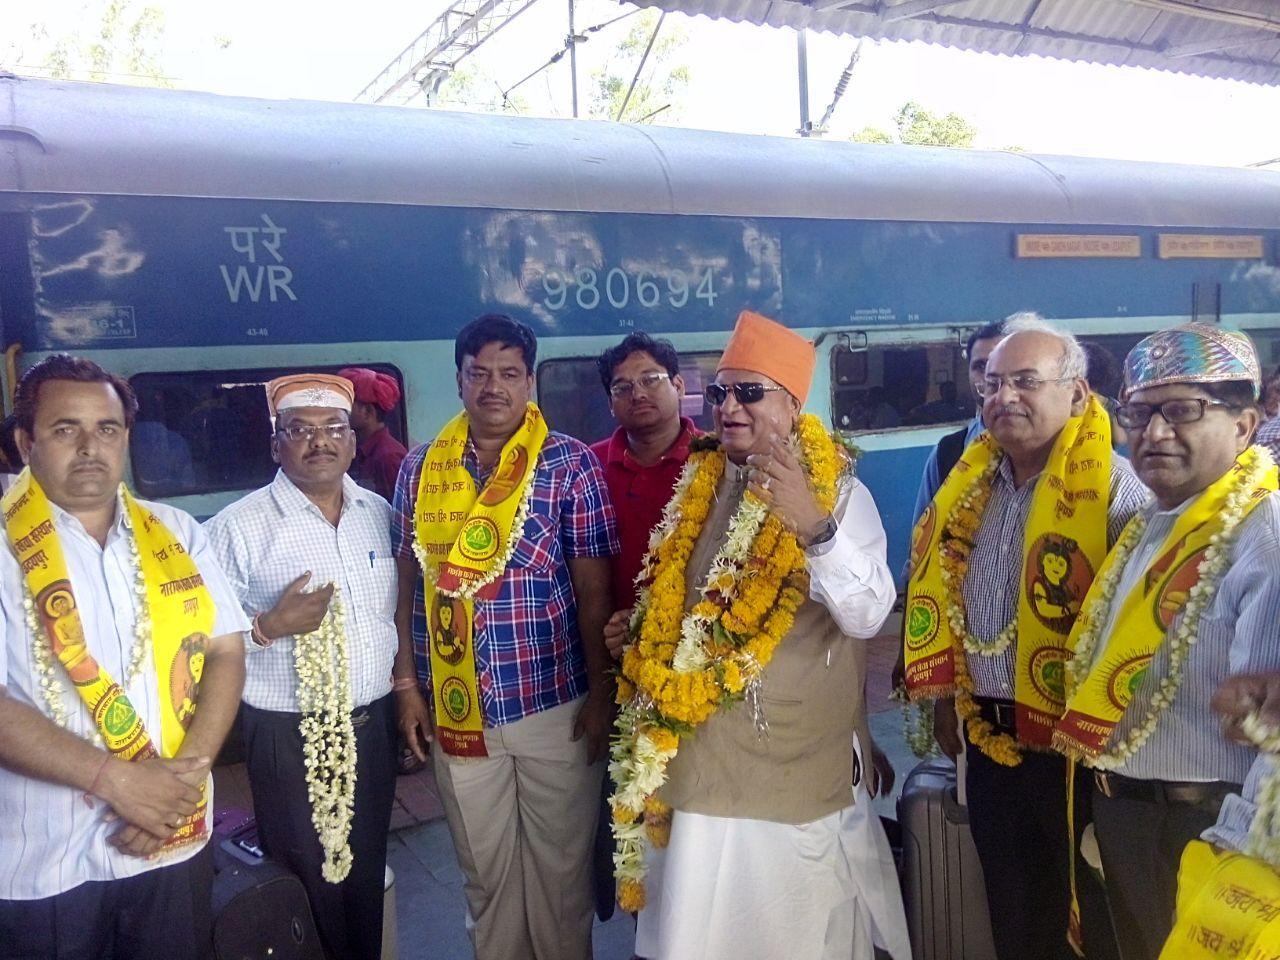 Welcomed and honored by Vaishya society at #Indore railway station. http://www.narayanseva.org  #NarayanSevaSansthan